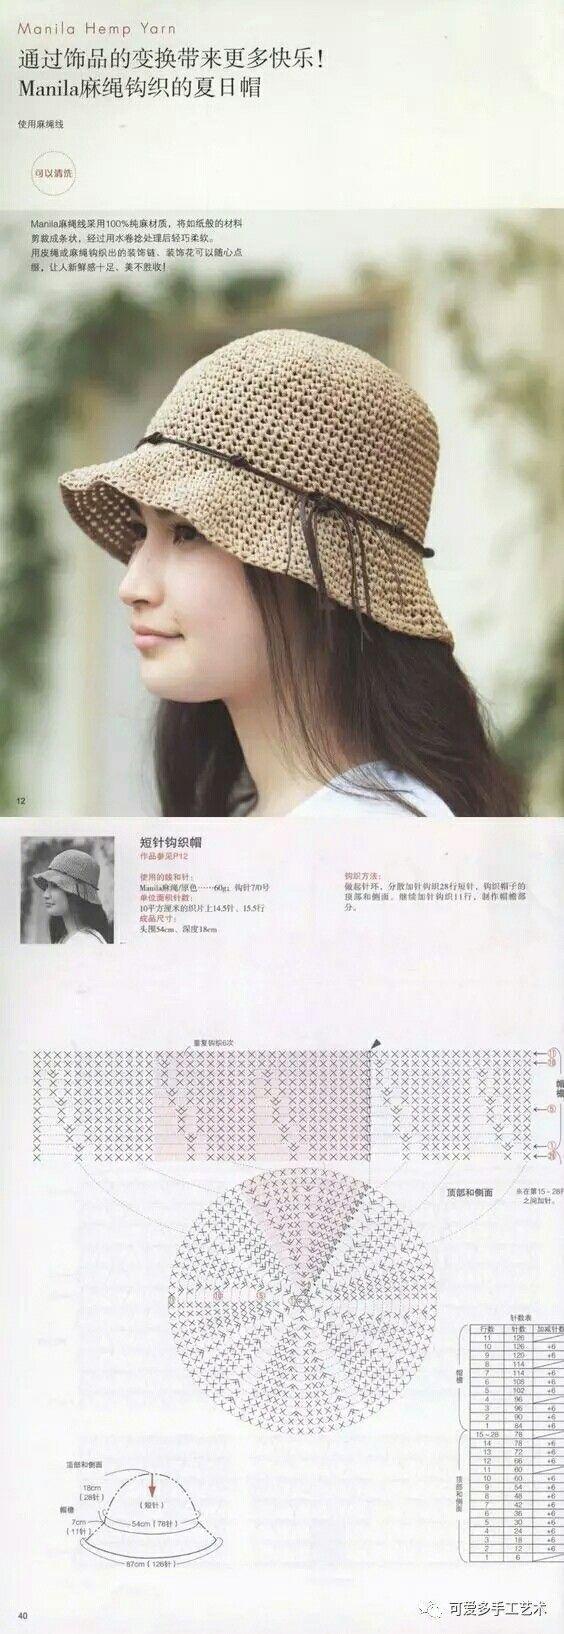 8 best 패턴모자 images on Pinterest | Crocheted hats, Crochet hats ...